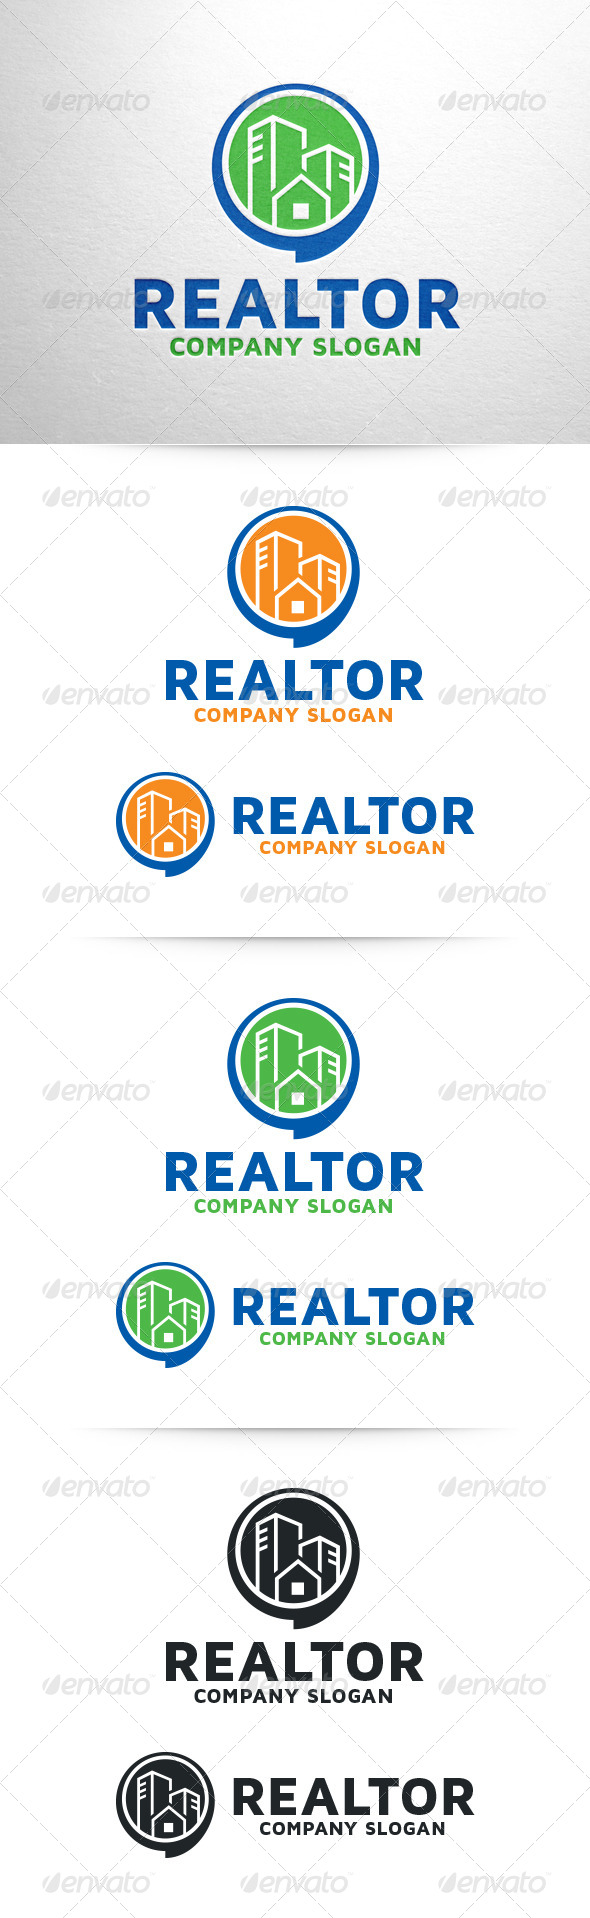 GraphicRiver Realtor Logo Template 6826194